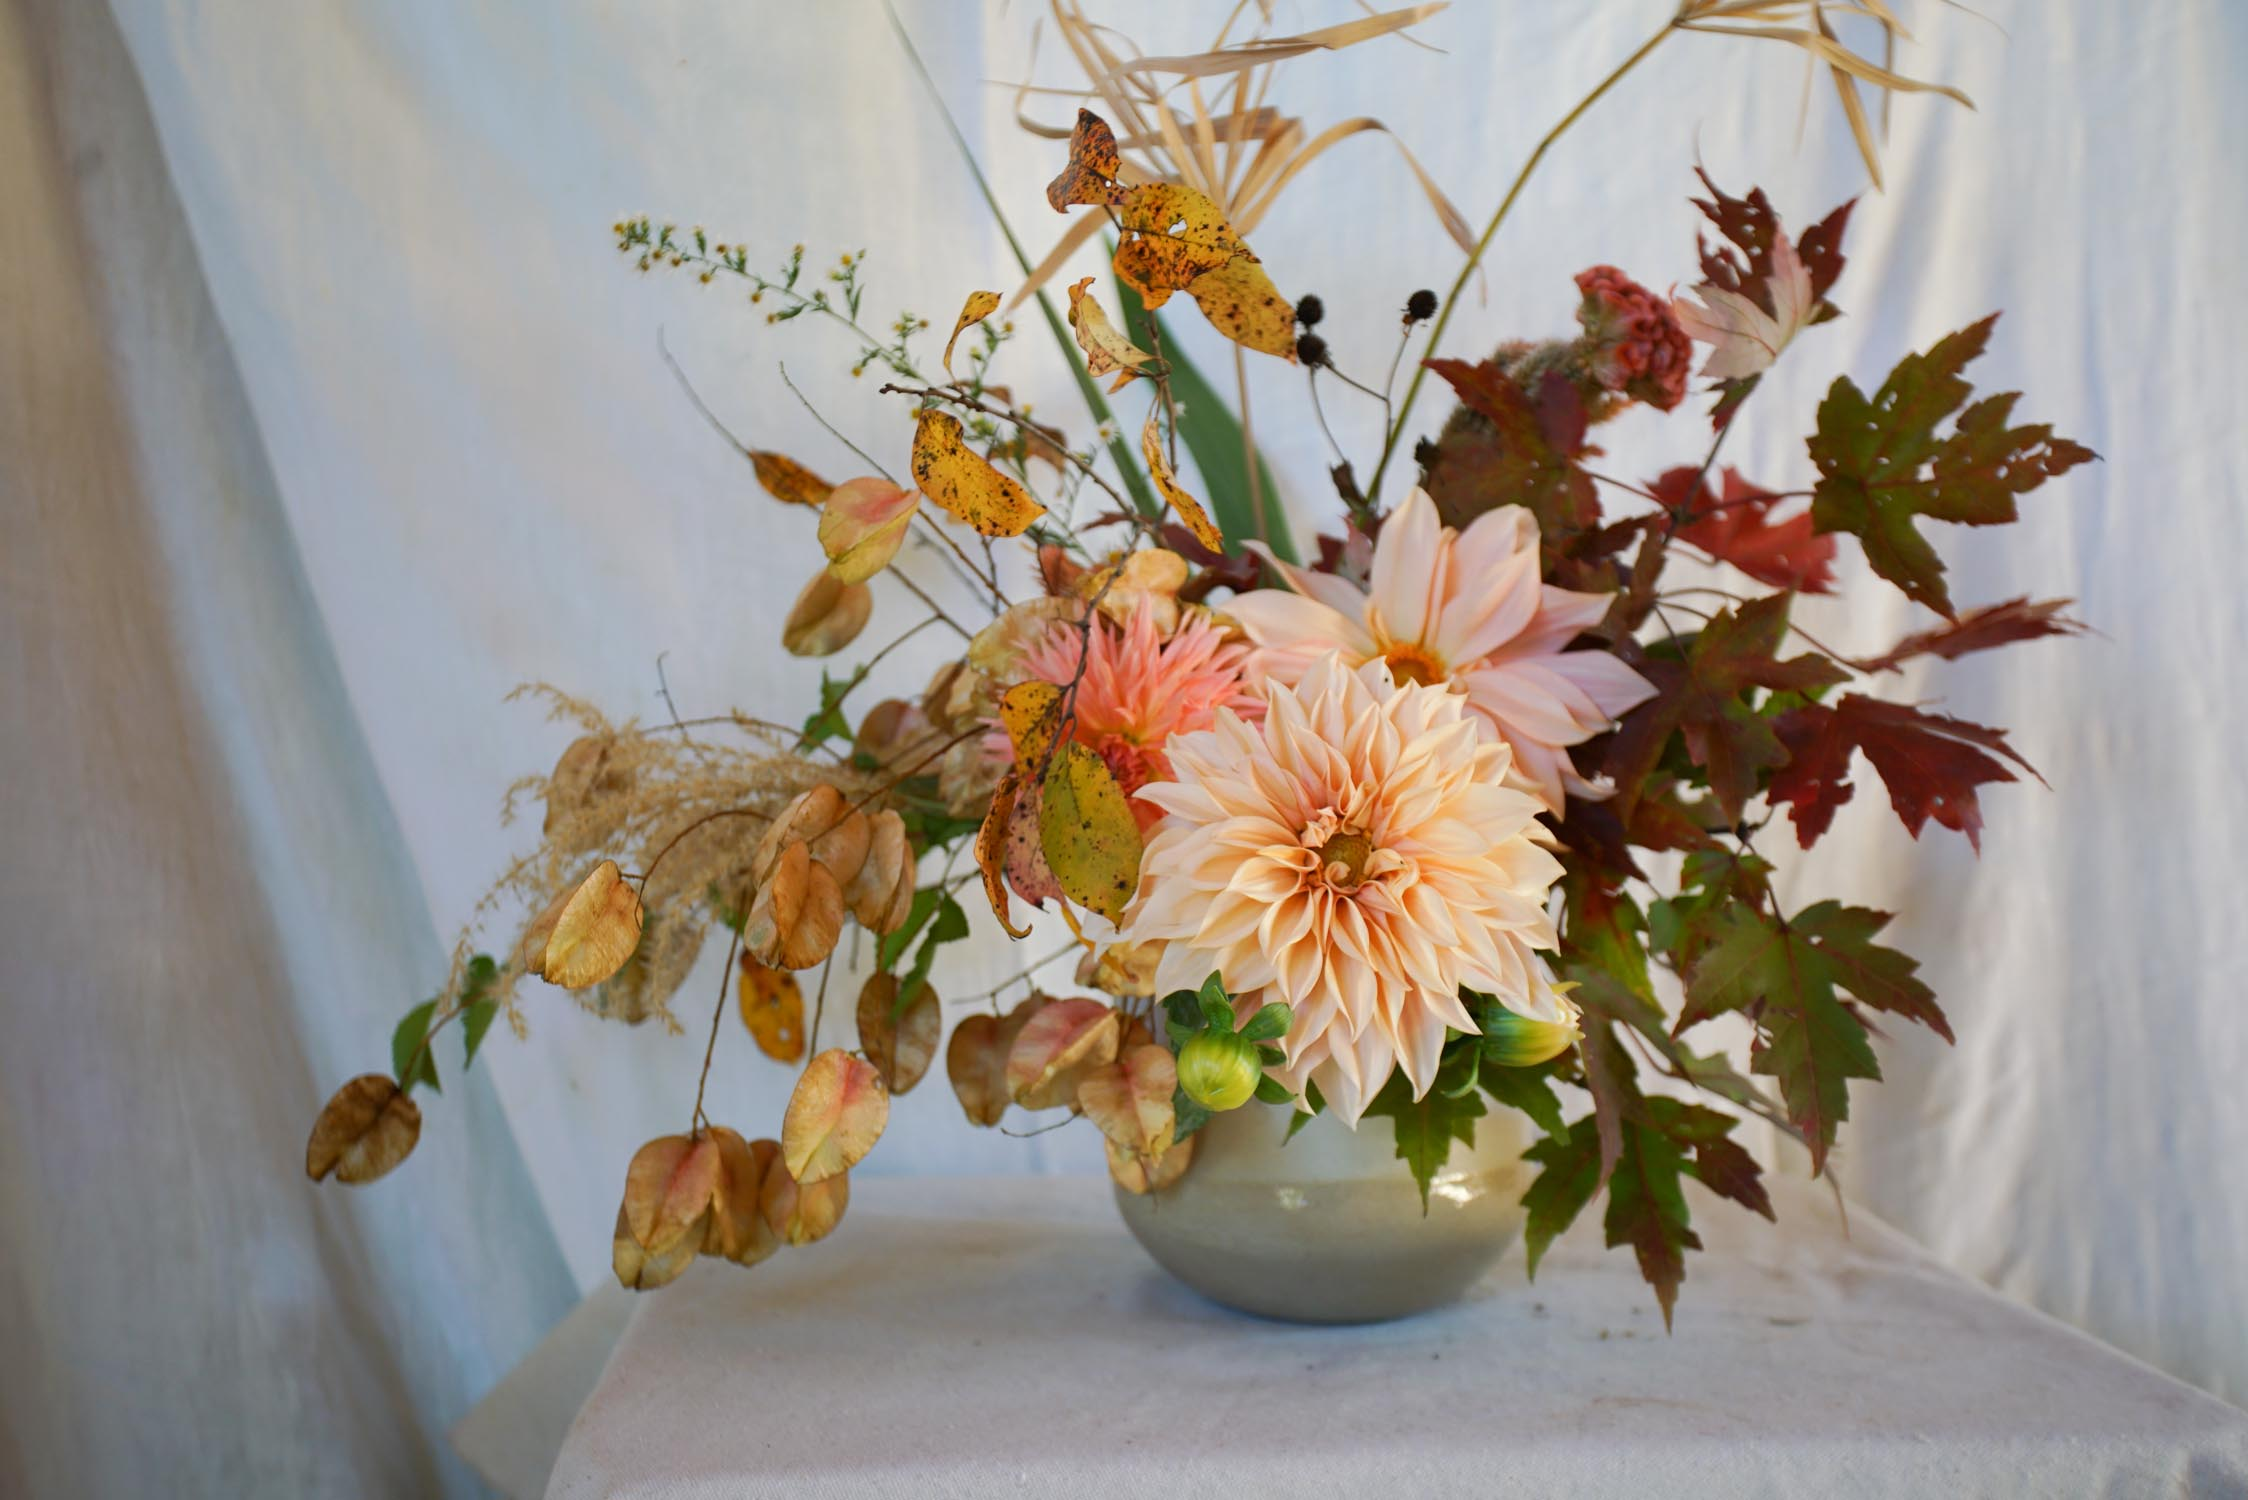 RA_3 porch farm 2016 flower social-2016101709045.jpg